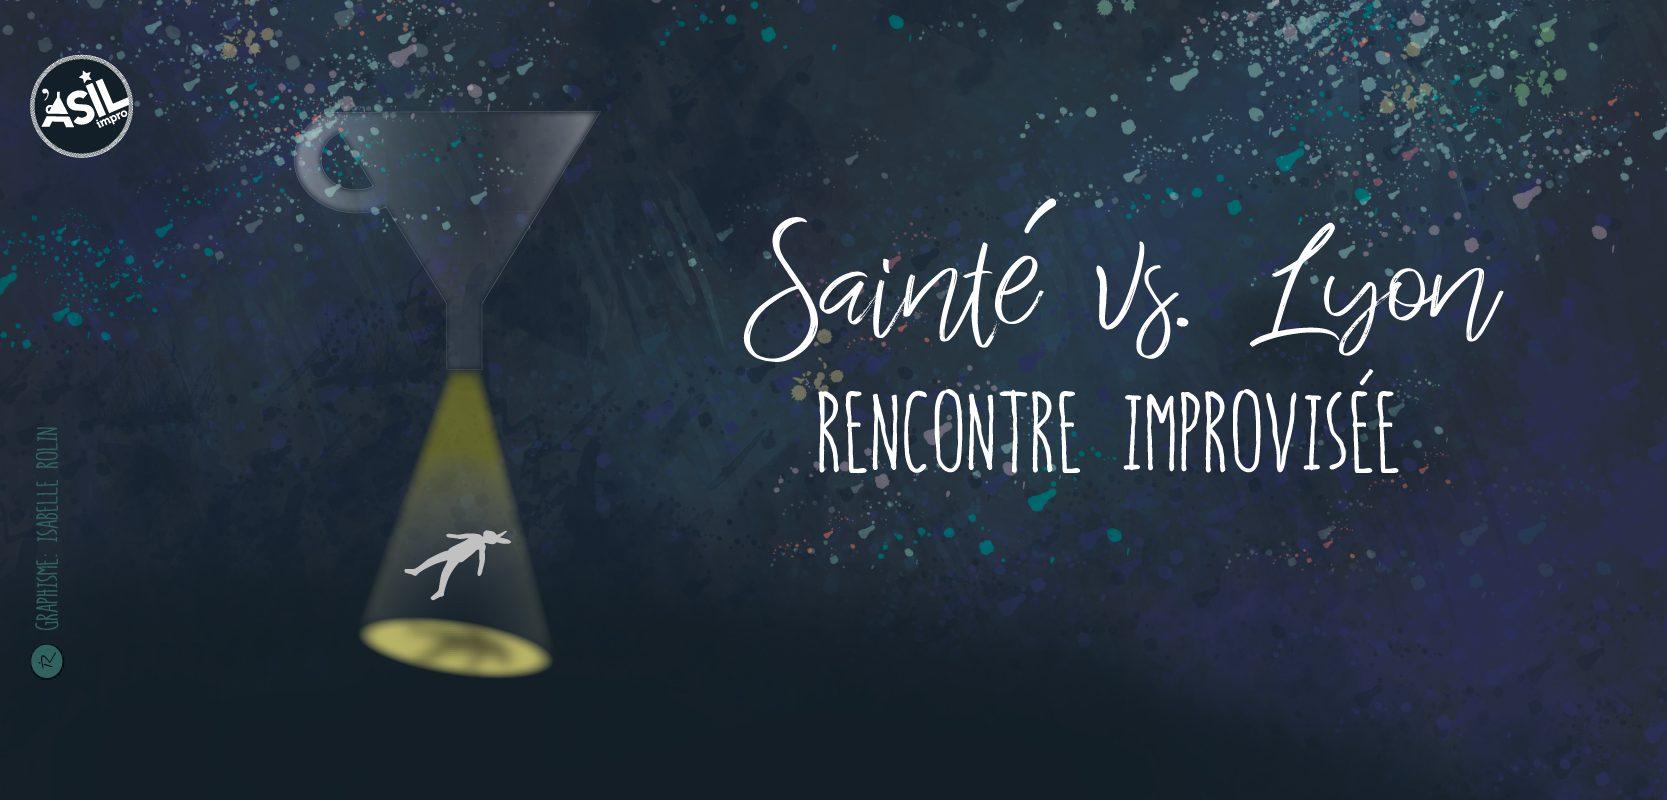 Permalink to: SAINTE vs LYON – Rencontre Improvisée